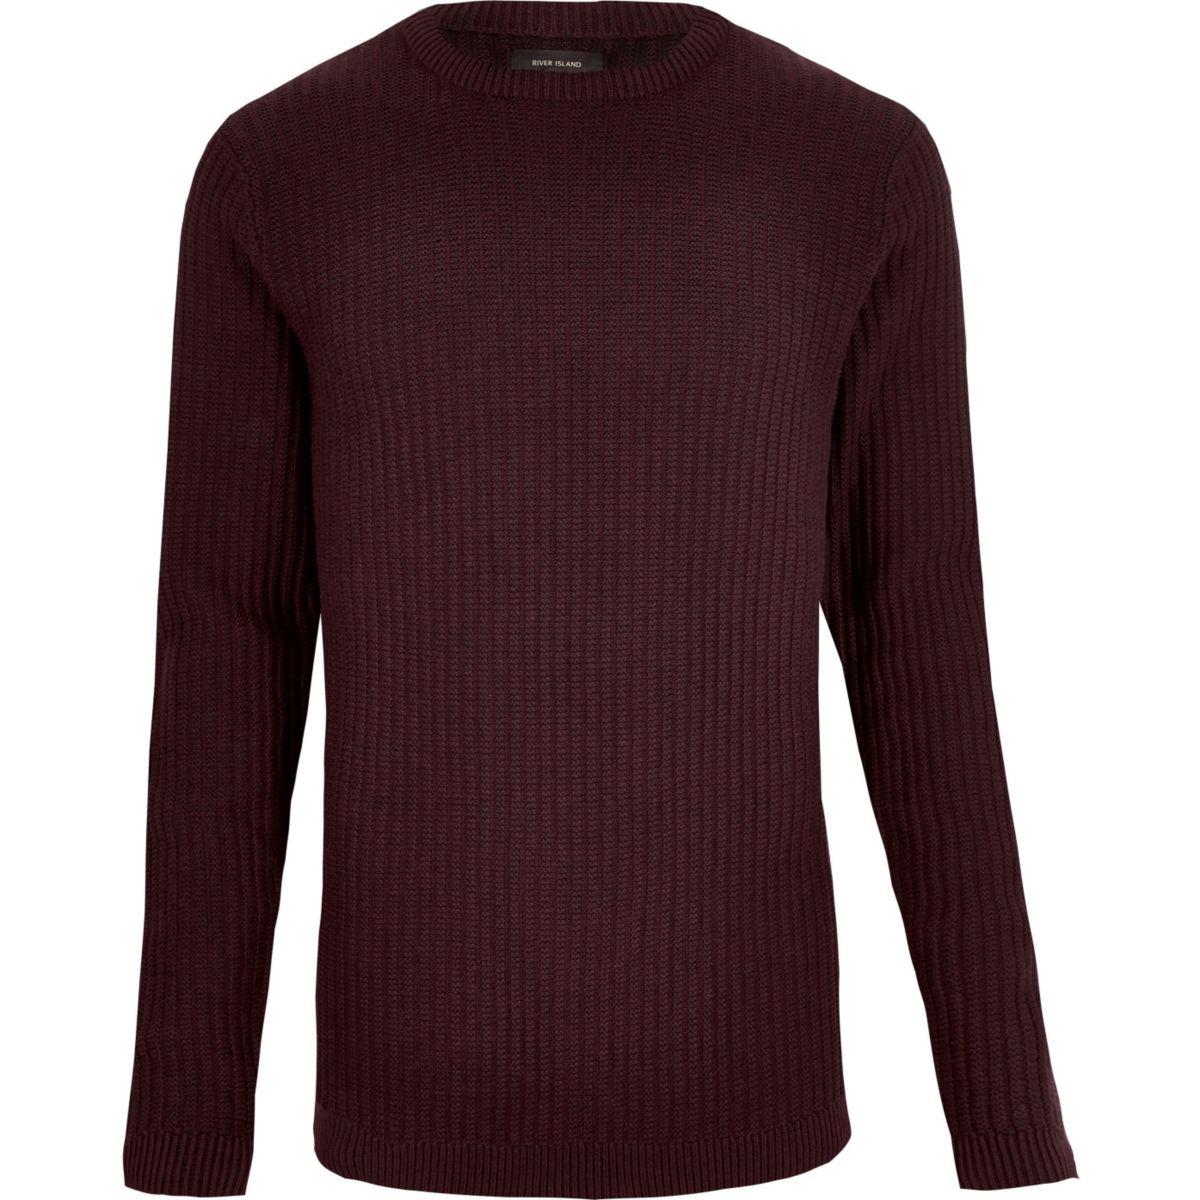 Burgundy ribbed slim fit long sleeve T-shirt